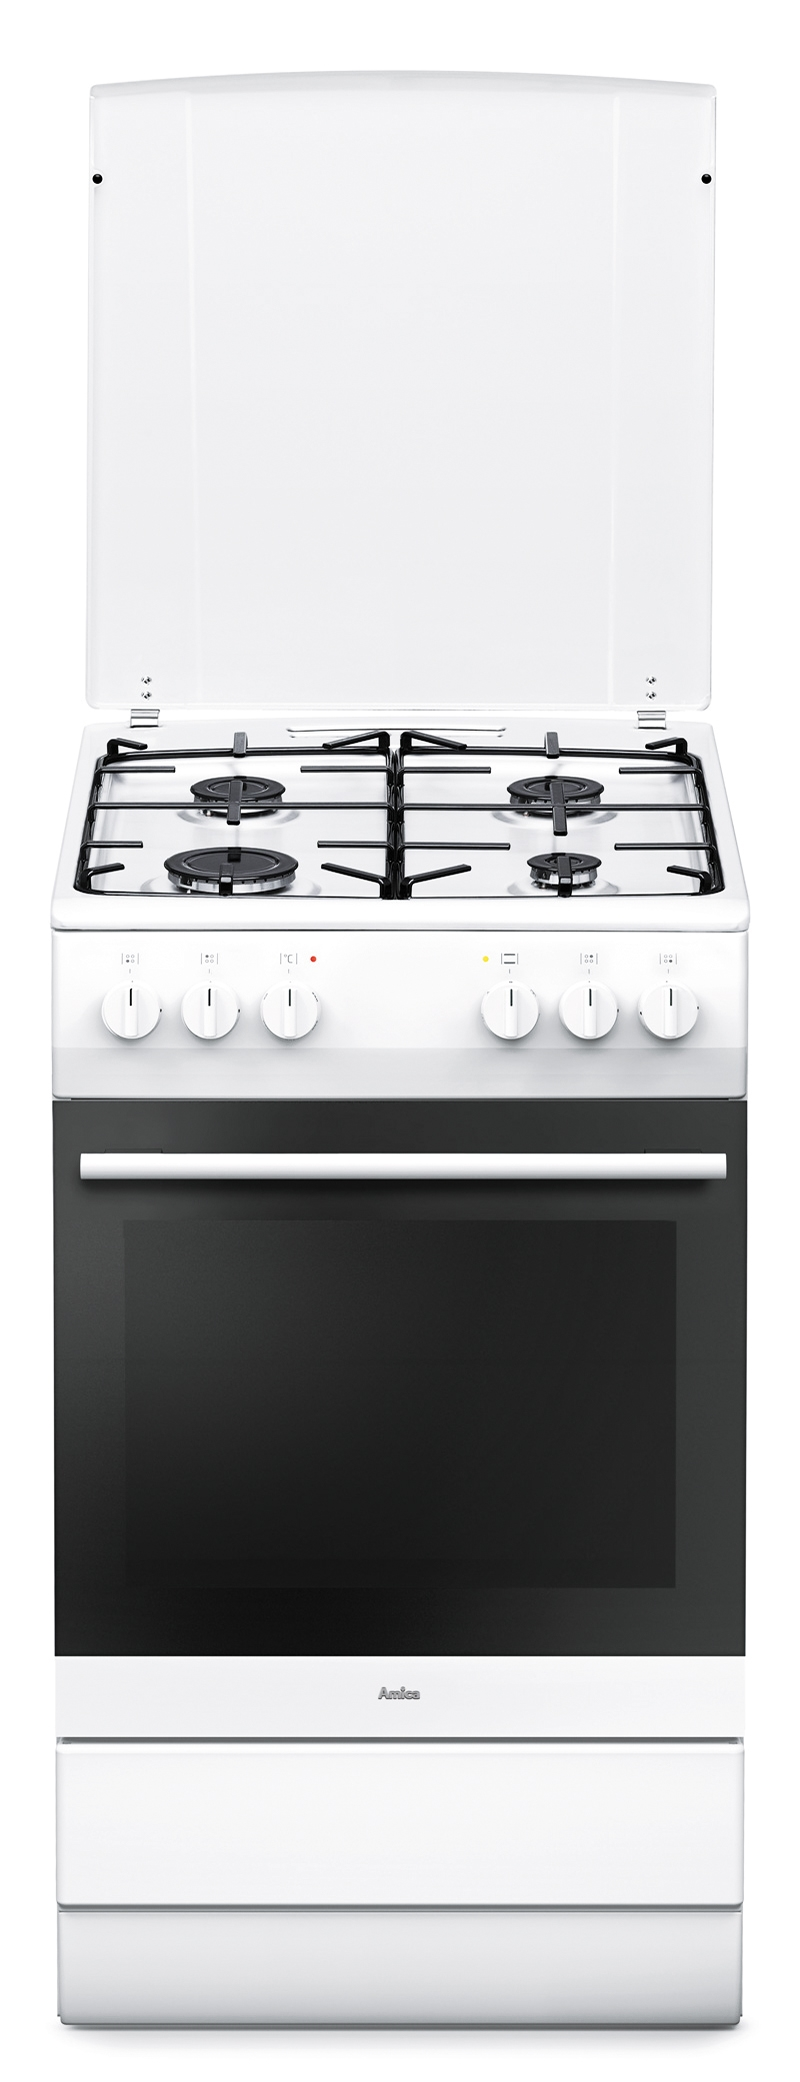 Amica SHEG 11557 W Gasherd mit Elektrobackofen/ Energieeffizienzklasse A